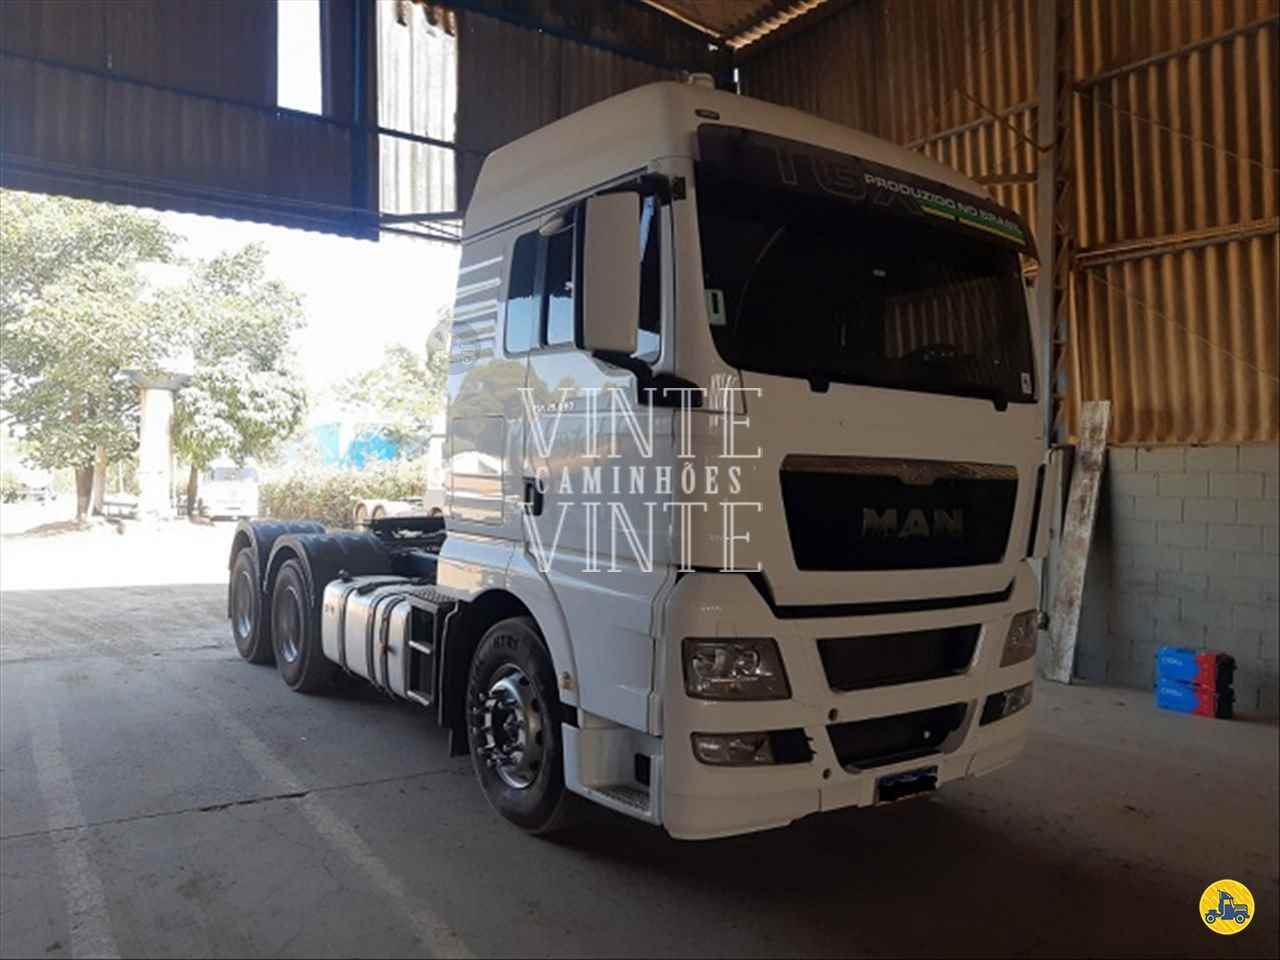 CAMINHAO MAN TGX 29 440 Cavalo Mecânico Traçado 6x4 Vinte-Vinte Caminhões SANTO ANDRE SÃO PAULO SP